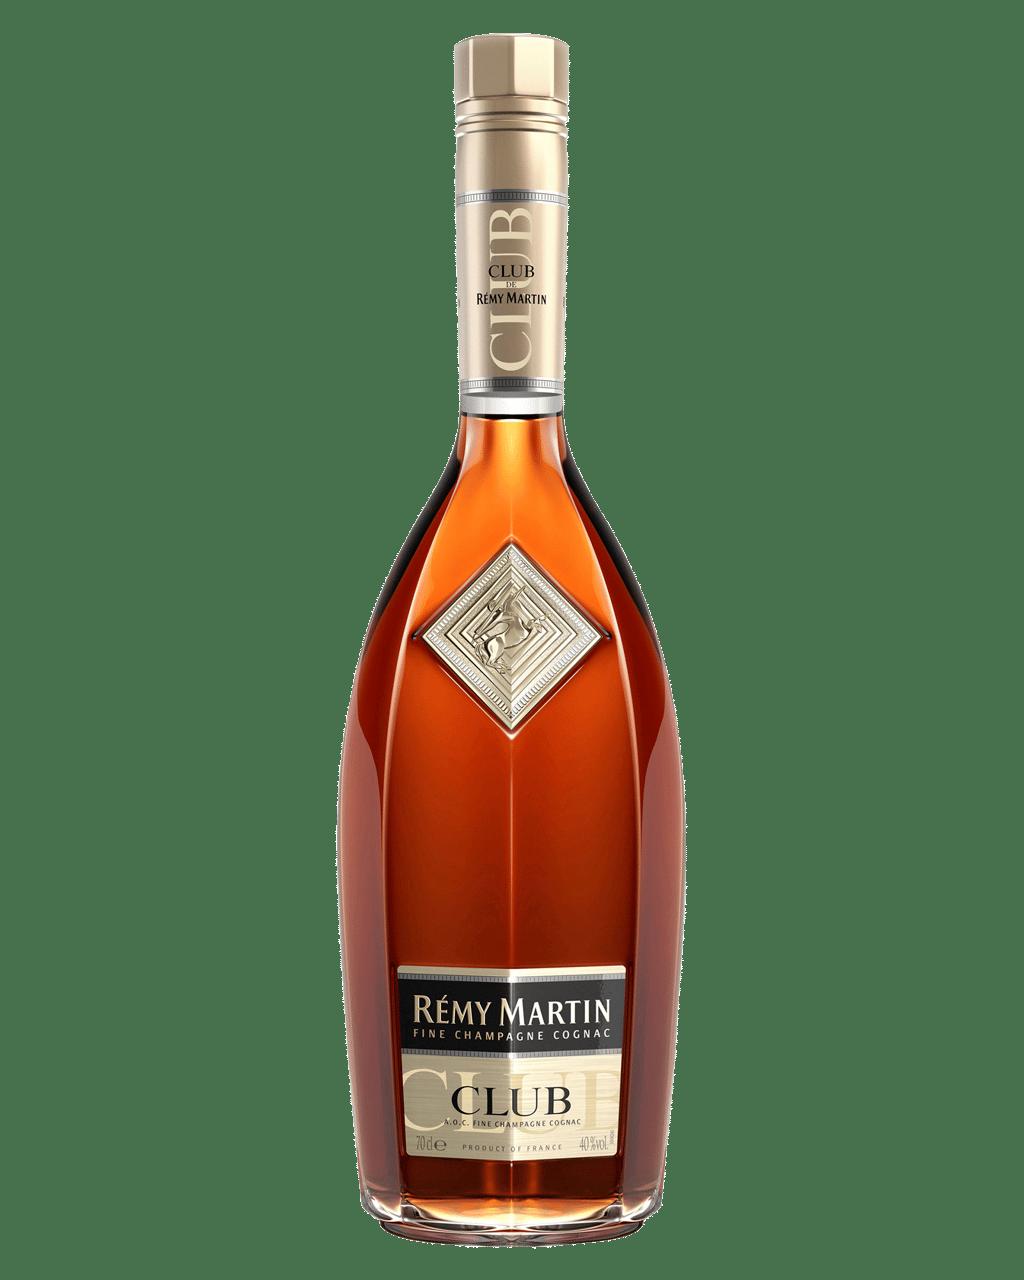 151a9fcc8f00 Rémy Martin Club Cognac 700mL